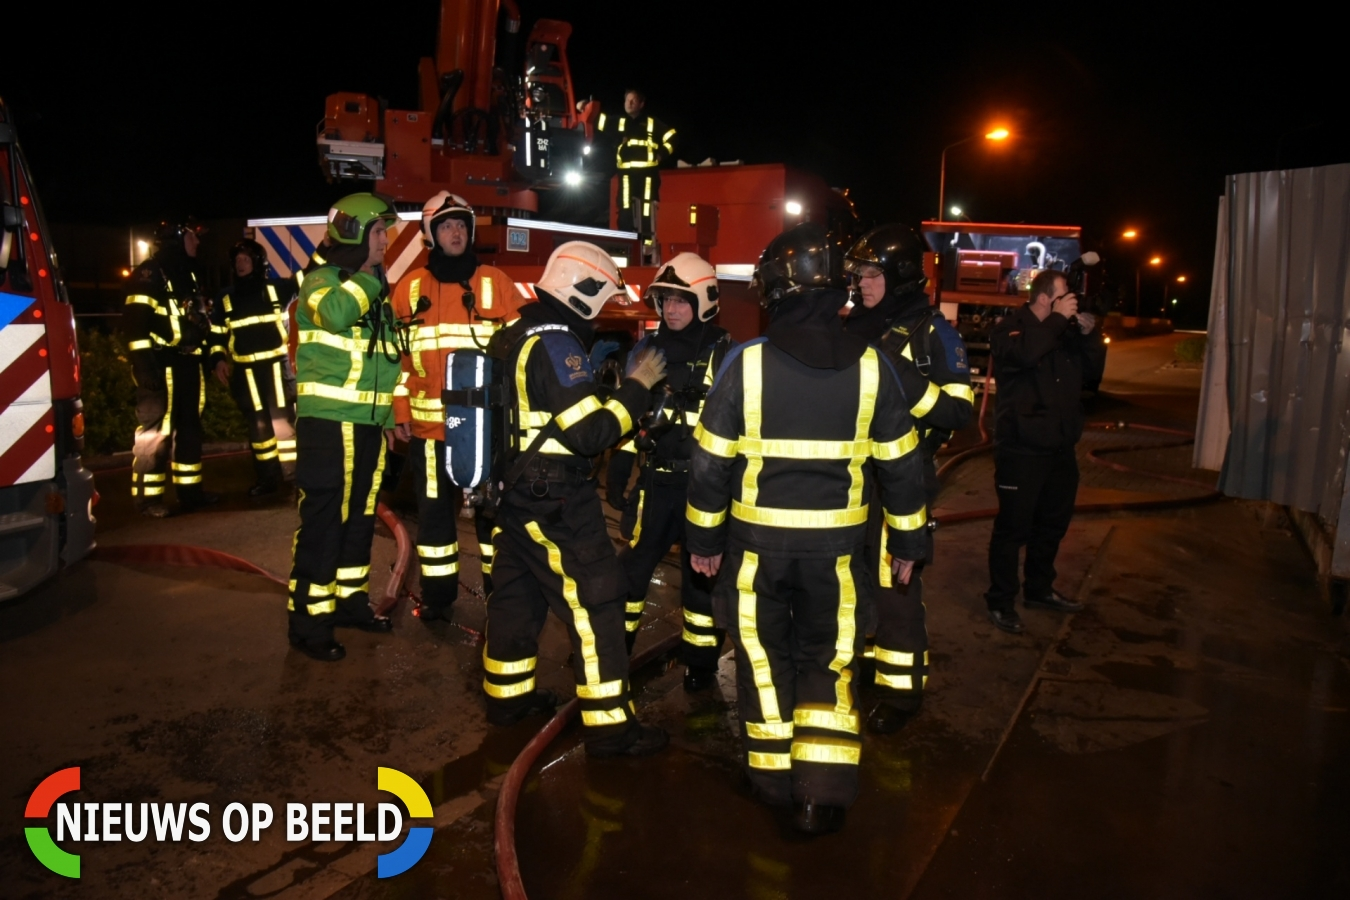 Grote brand in loods van metaalrecycling bedrijf Nijverheidsweg Heinenoord